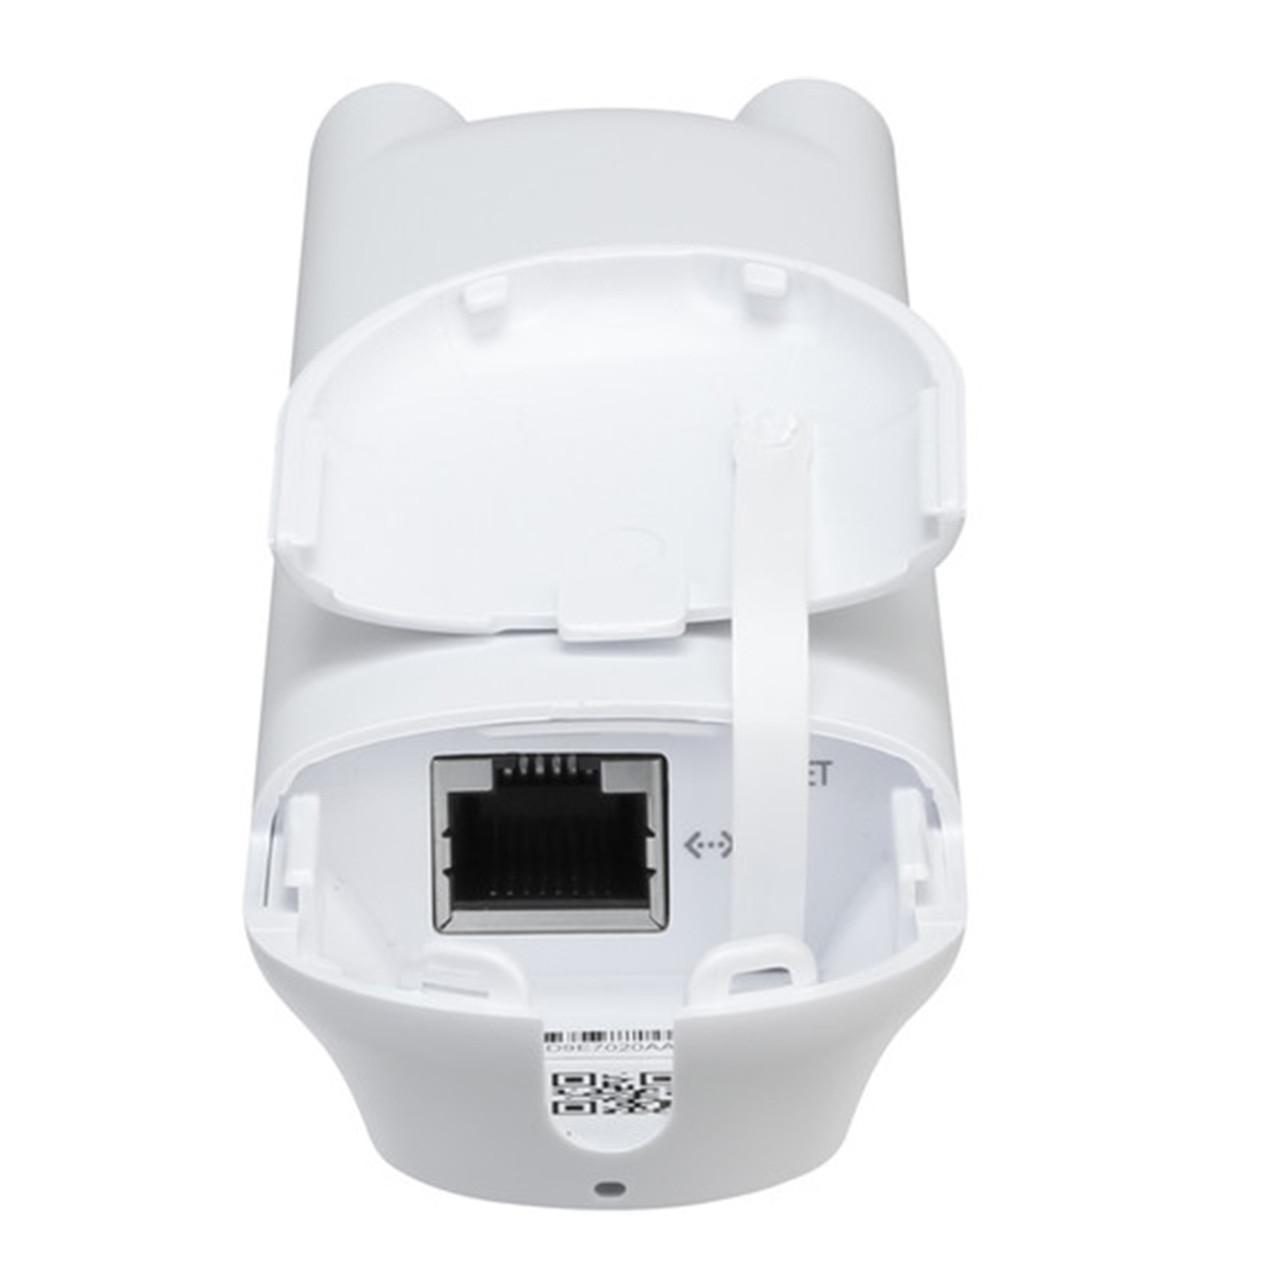 5-Pack Ubiquiti UAP-AC-M-5 UniFi Mesh Wide-Area 802.11ac Dual-Band Access Point